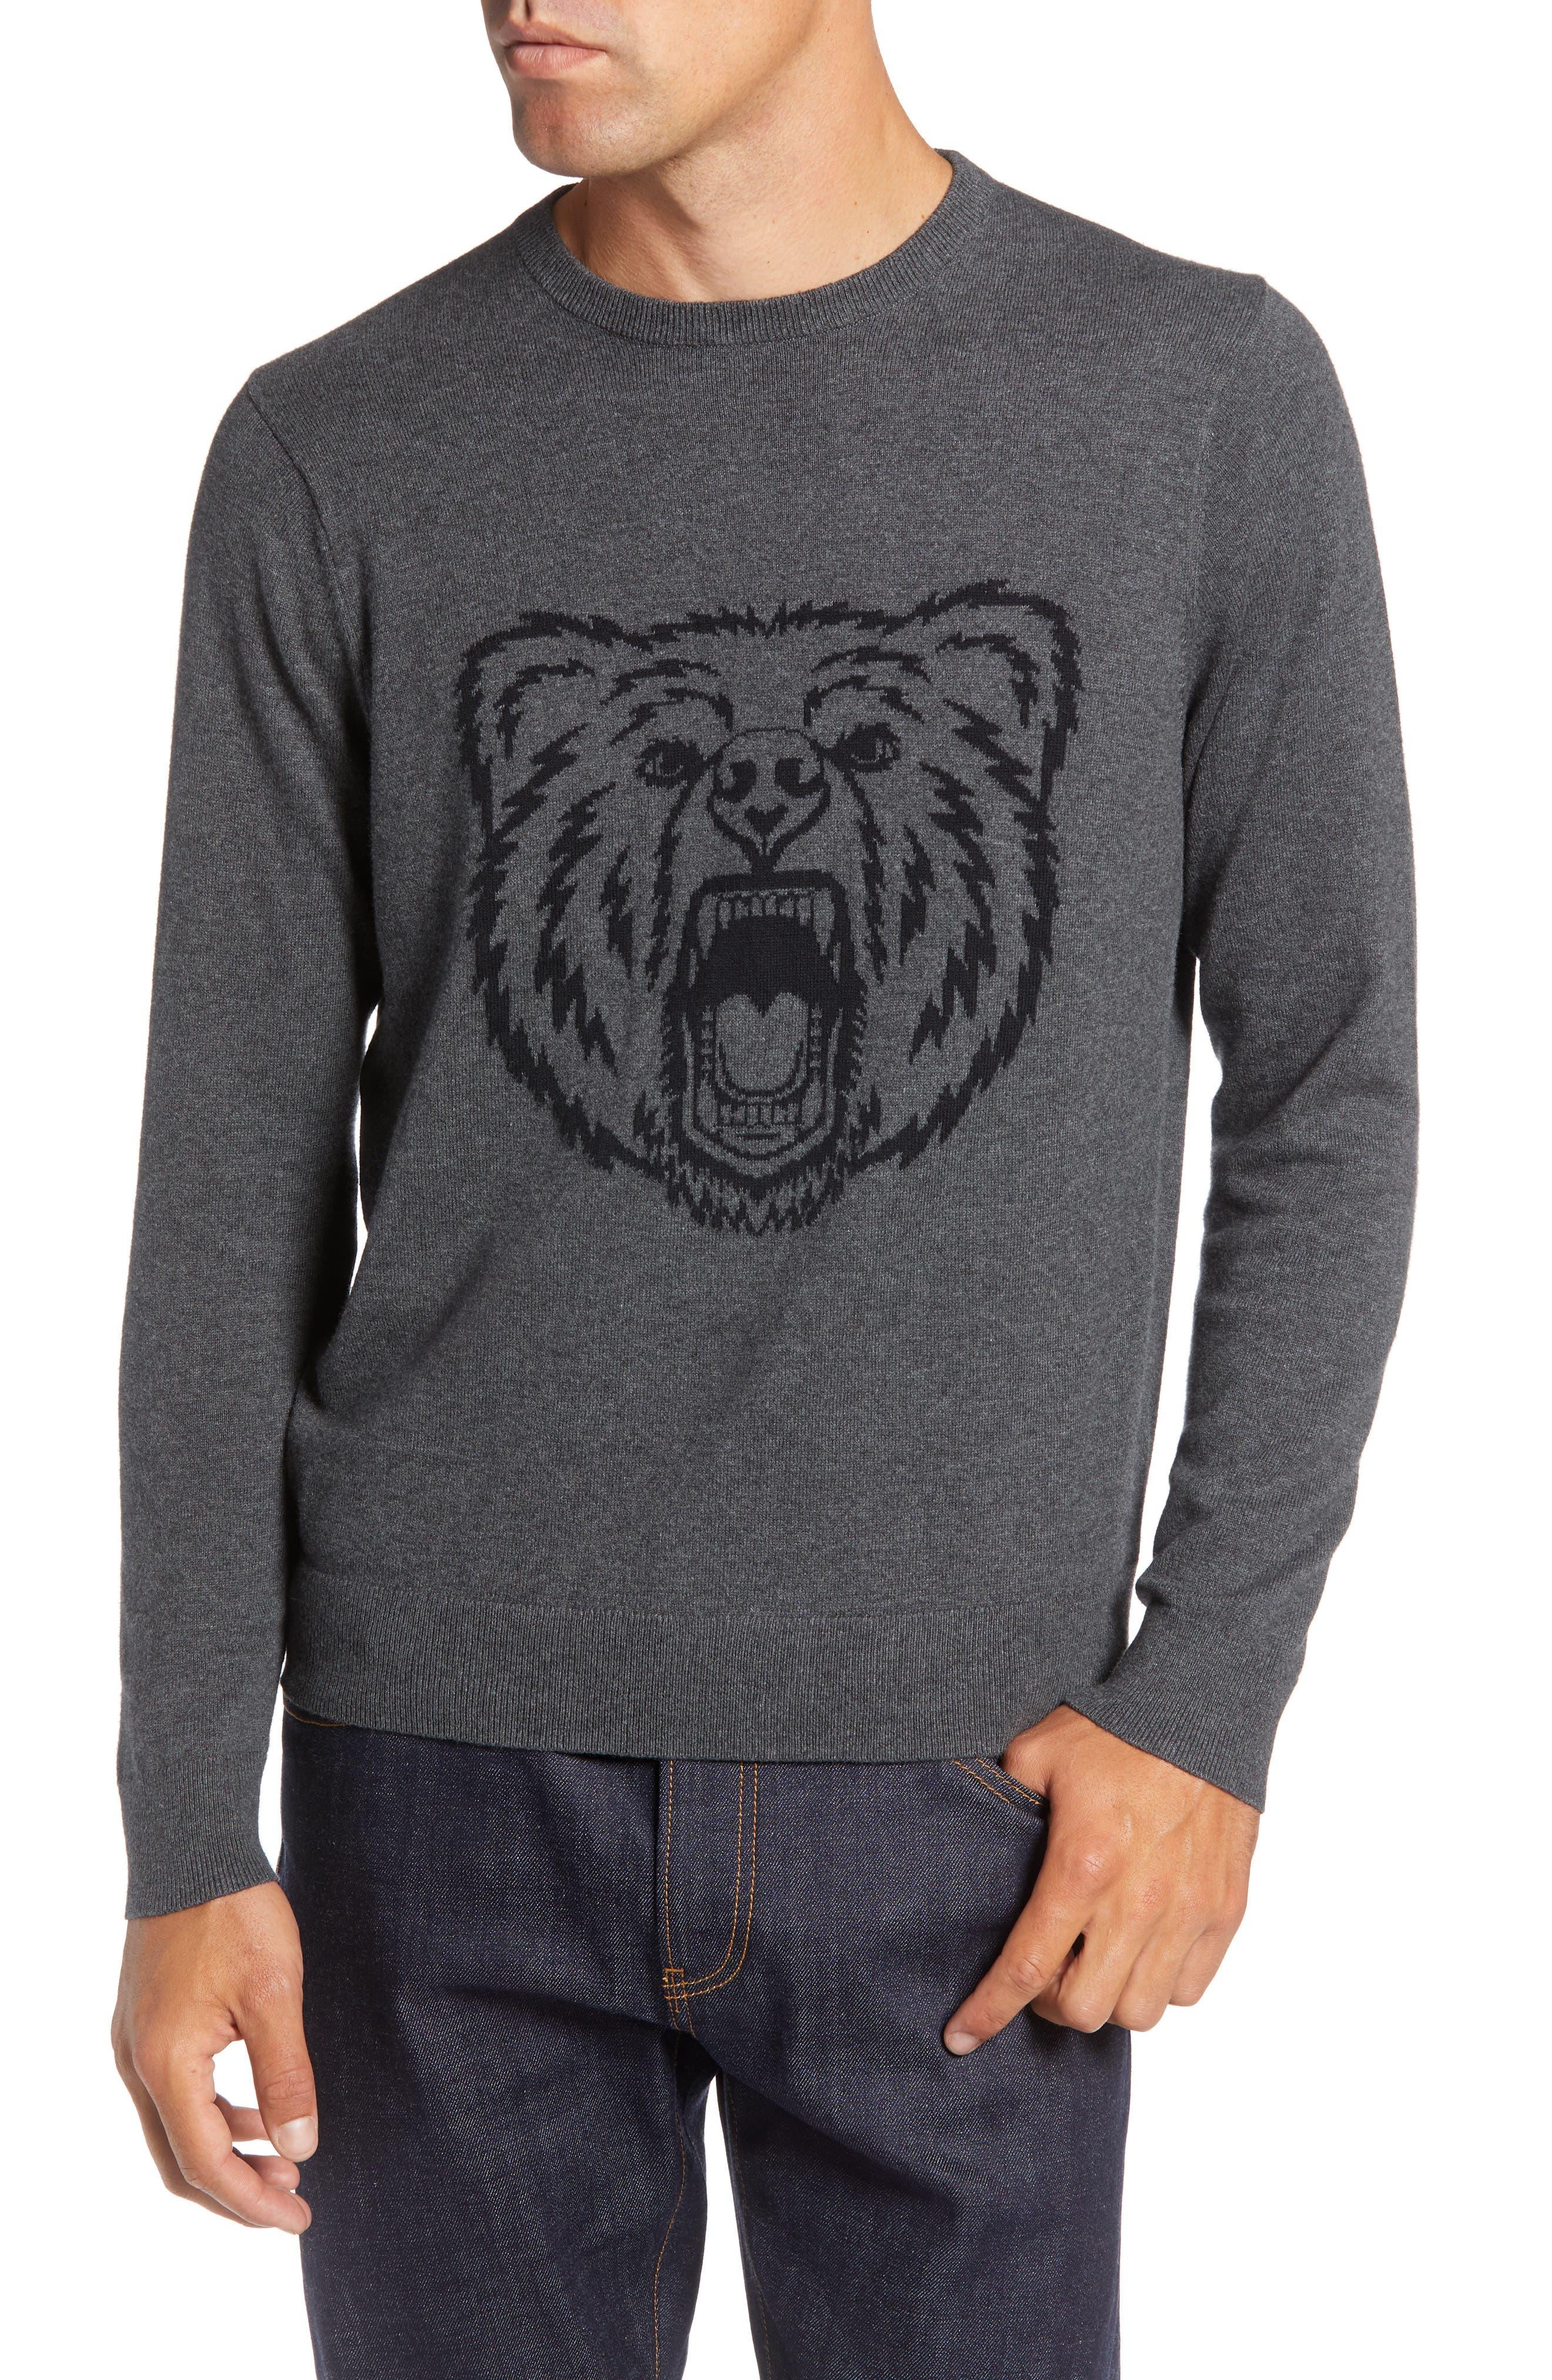 Bear Crewneck Sweater,                             Main thumbnail 1, color,                             GREY CASTLEROCK MARL BEAR